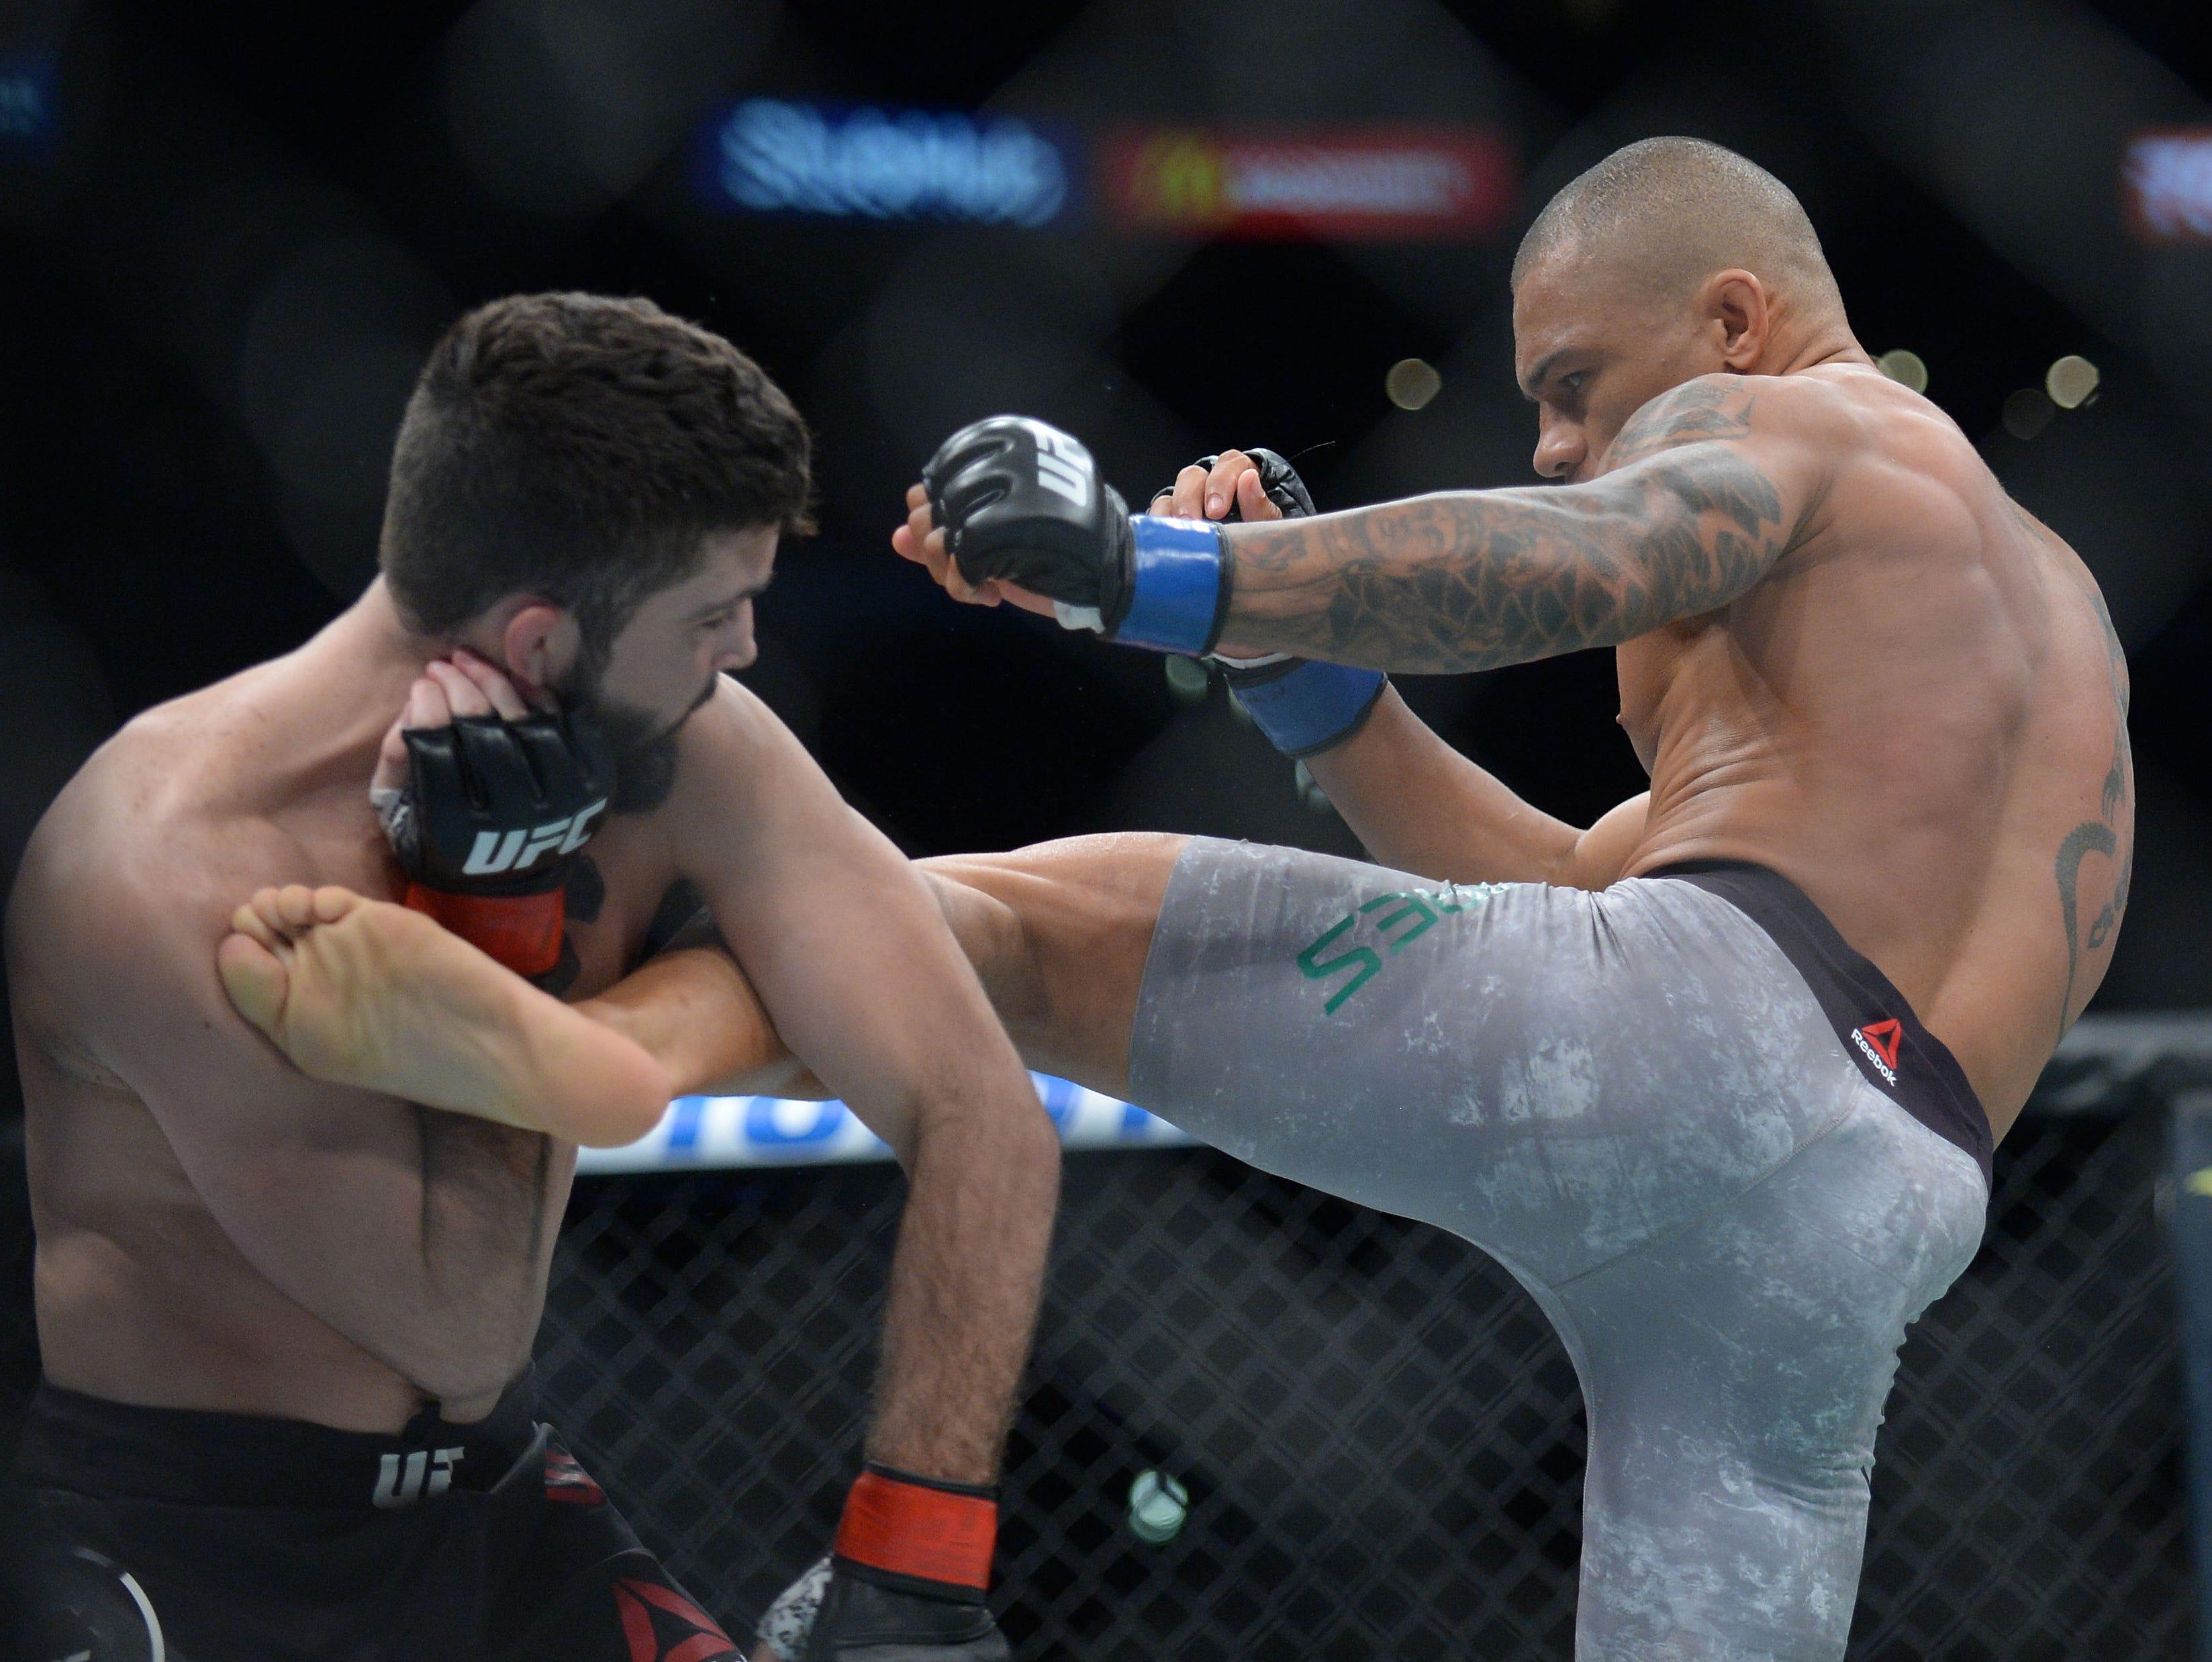 Sheymon Moreas lands a kick against Matt Sayles during UFC 227 at Staples Center.